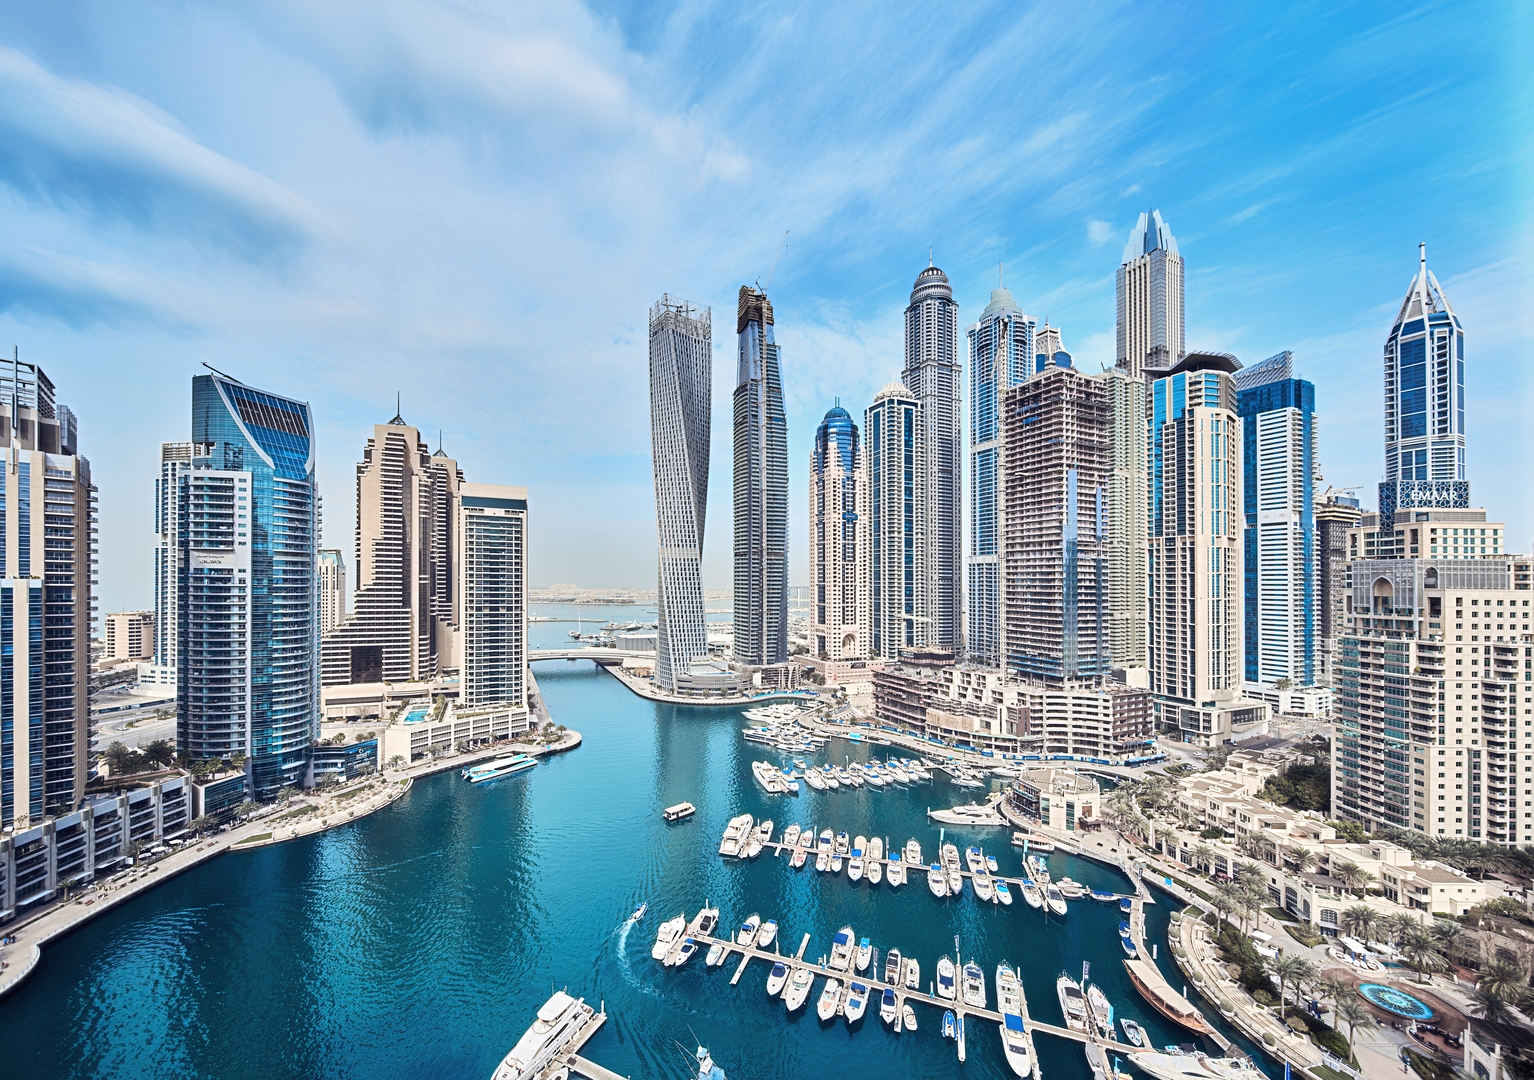 Dubai marina with modern skycrapers